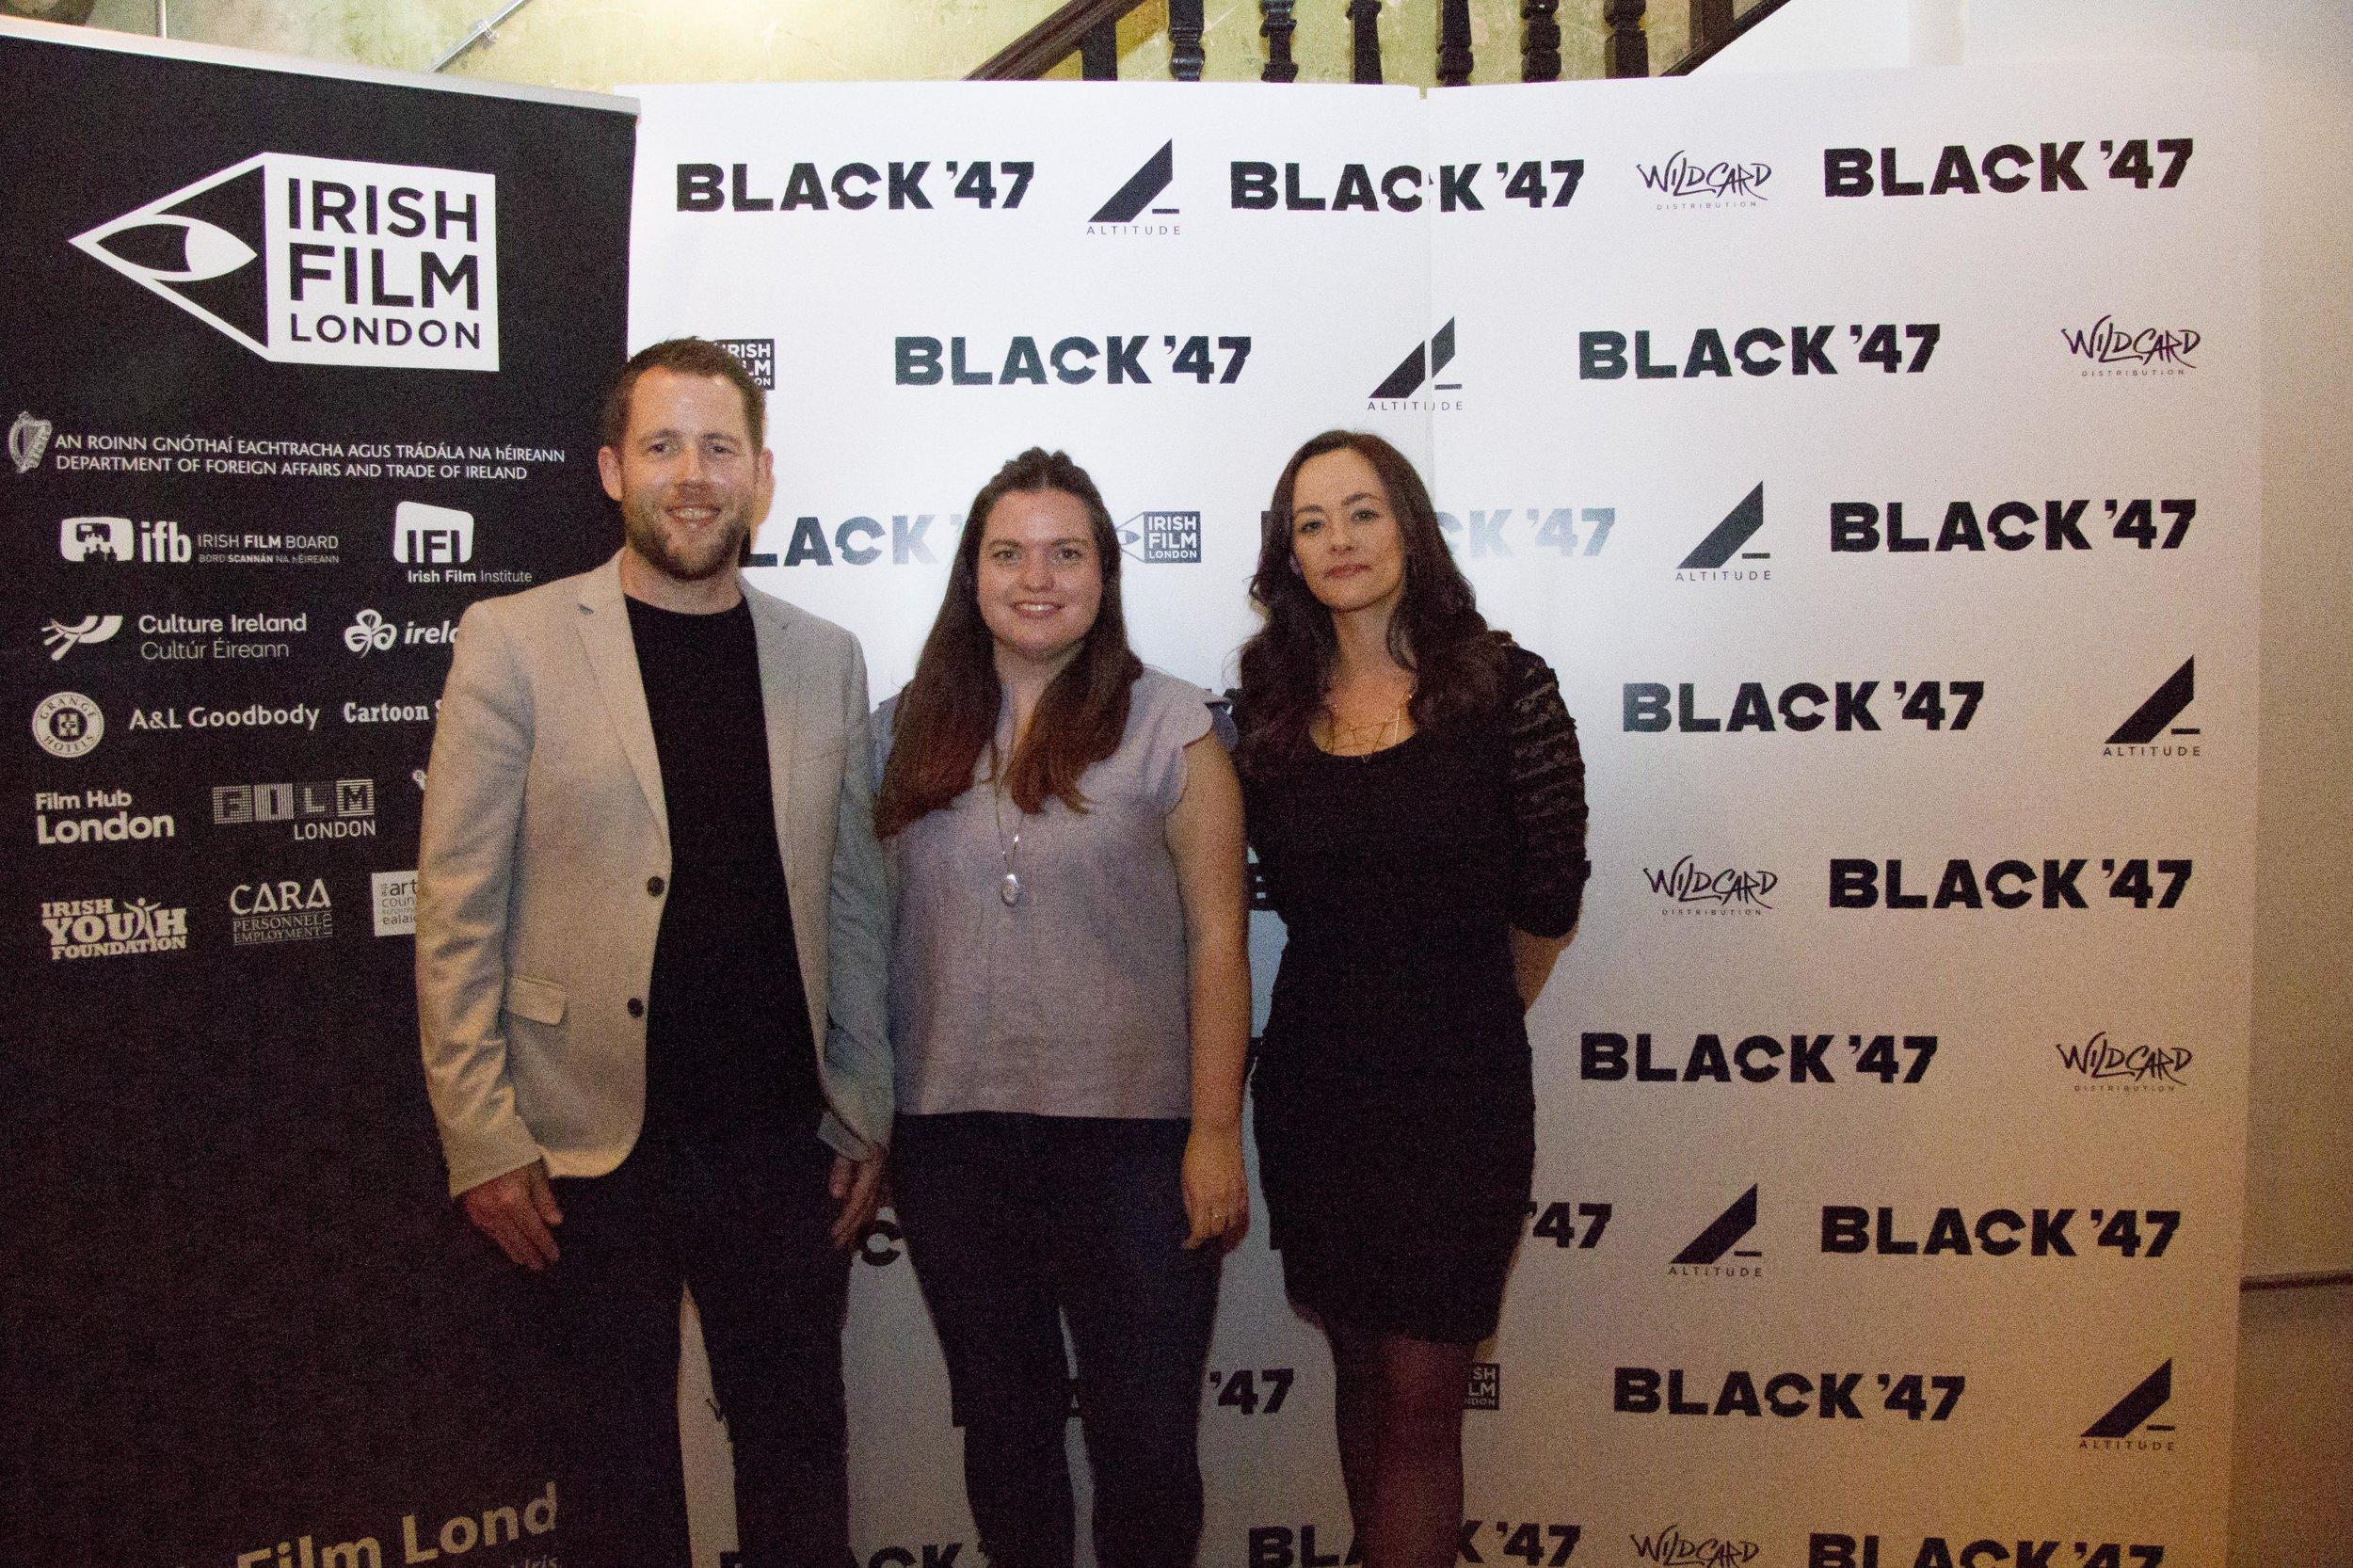 Black 47 London Premiere 2018 Photos courtesy of Noel Mullen Irish Film London 74 Macdara Kelleher Sile Cully and Kelly O Connor.jpg